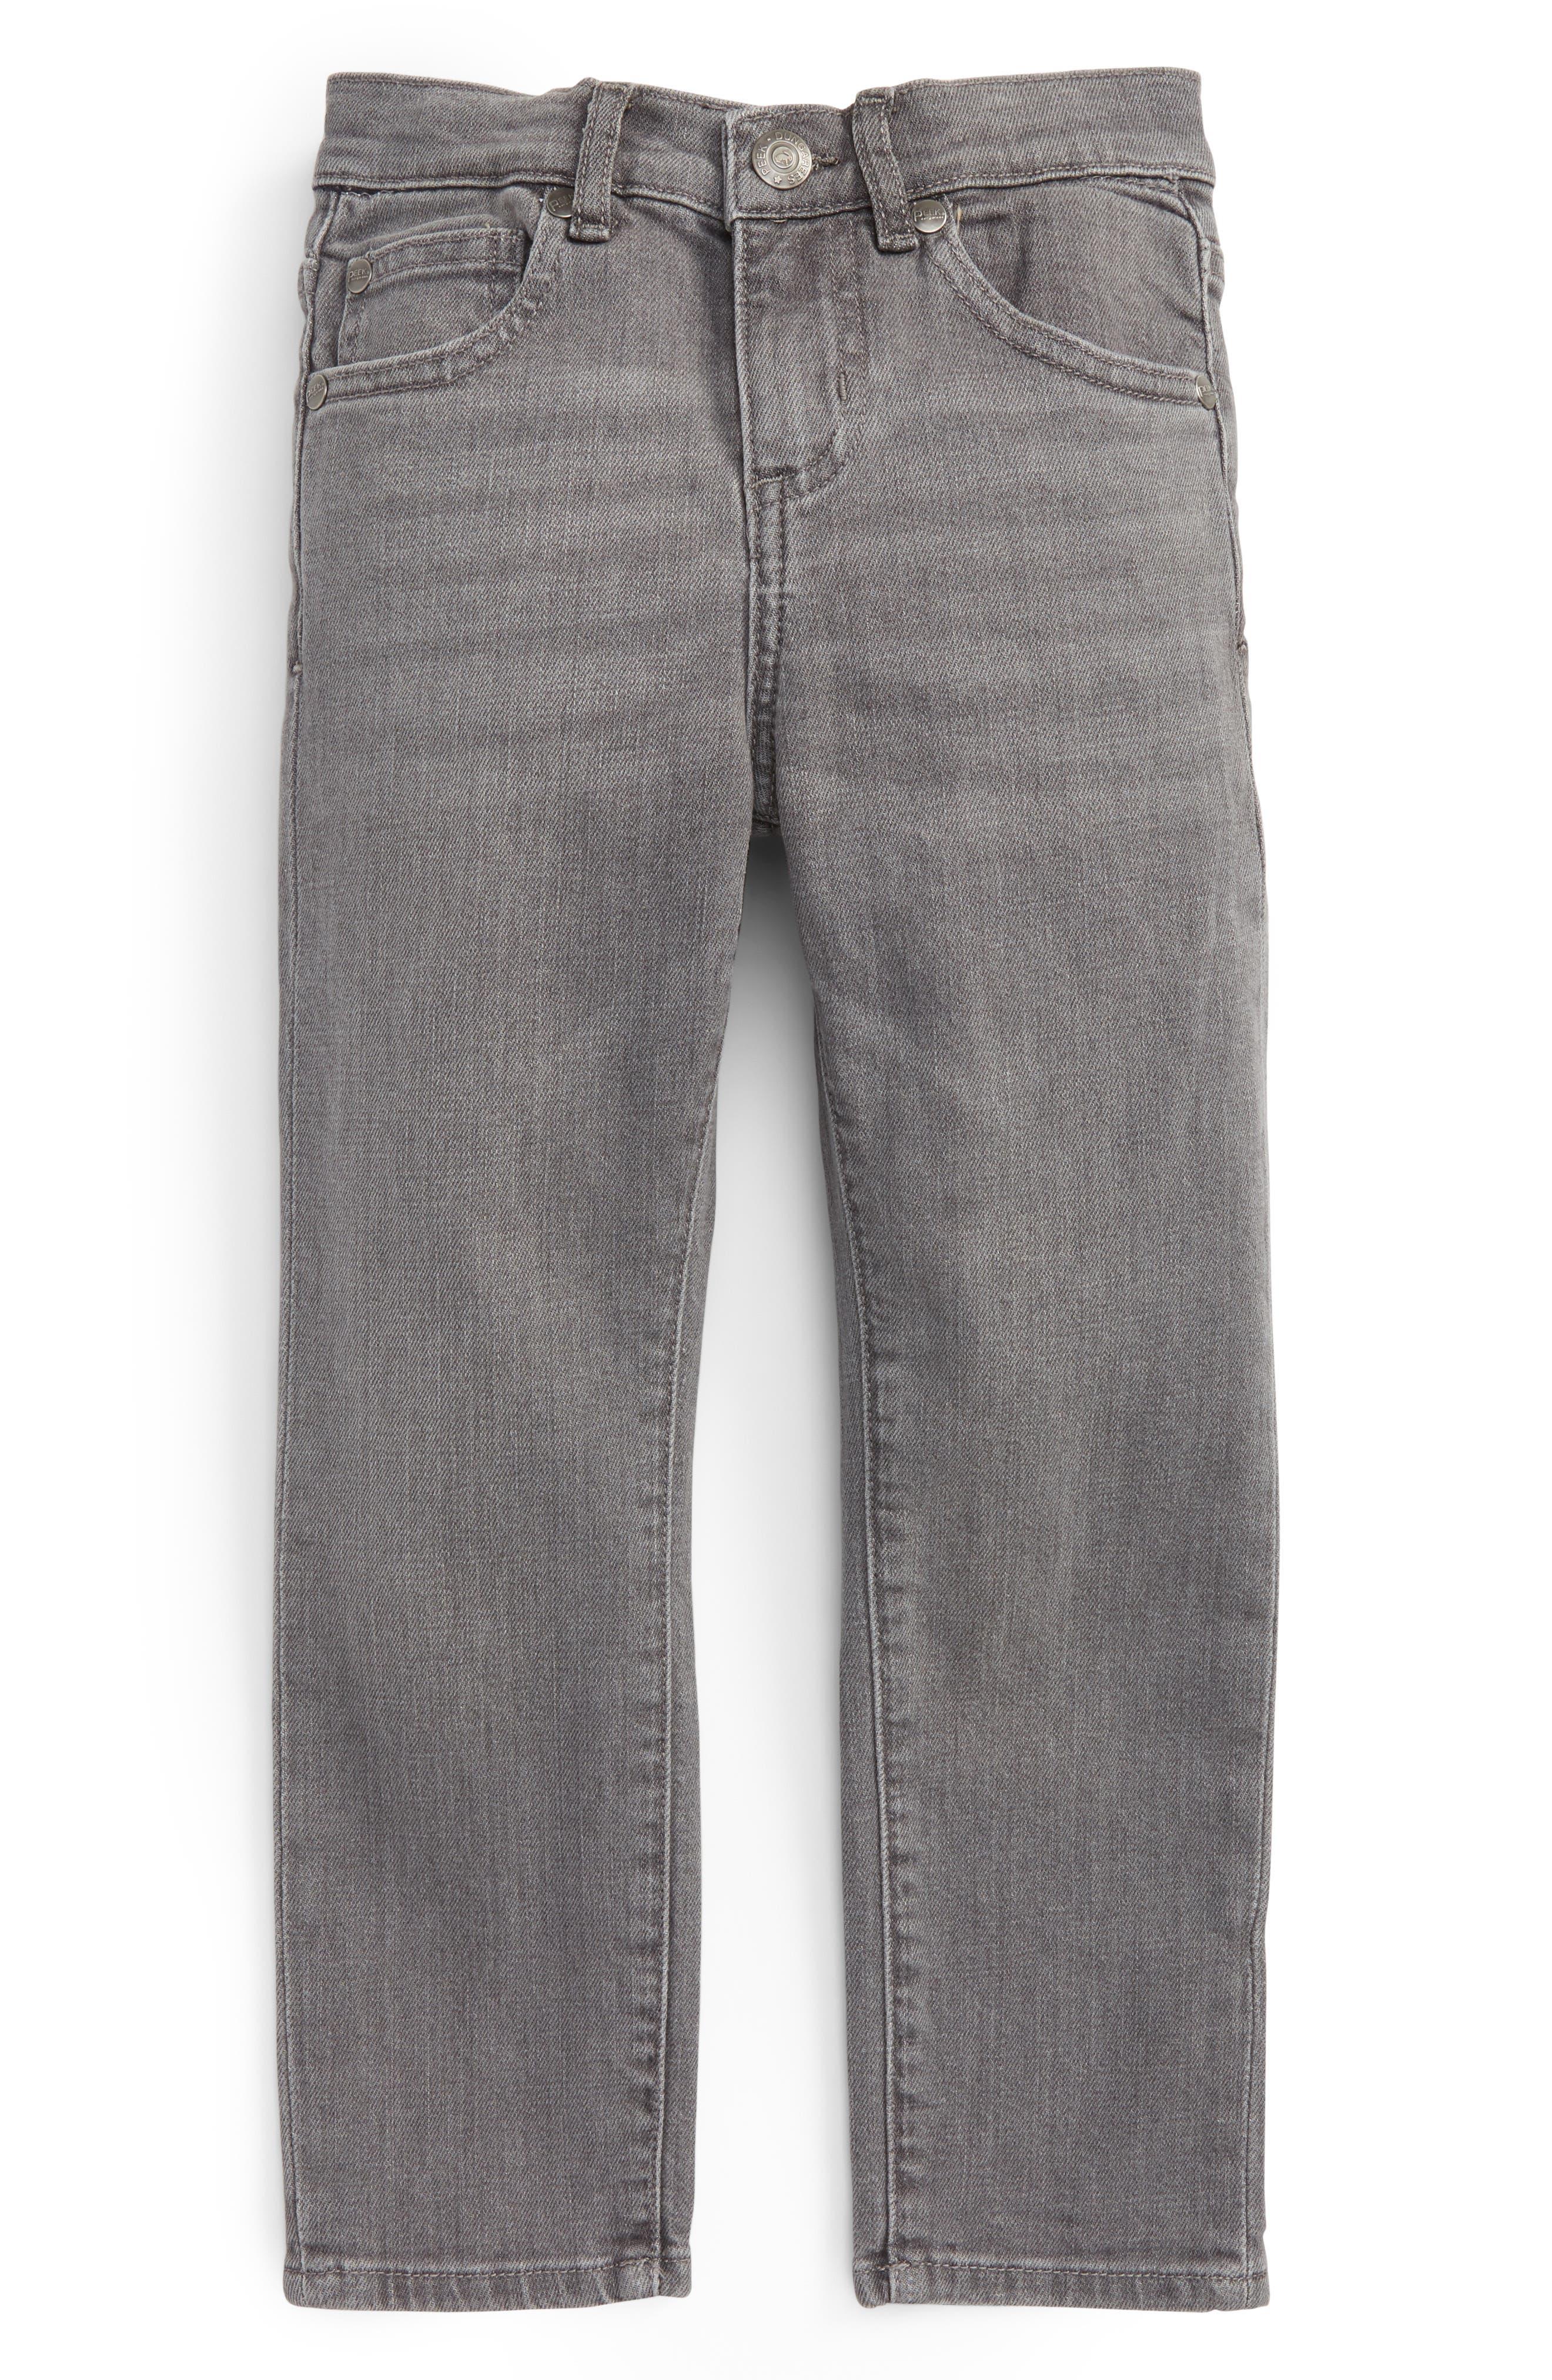 Main Image - Peek Slouch Jeans (Toddler Boys, Little Boys & Big Boys)